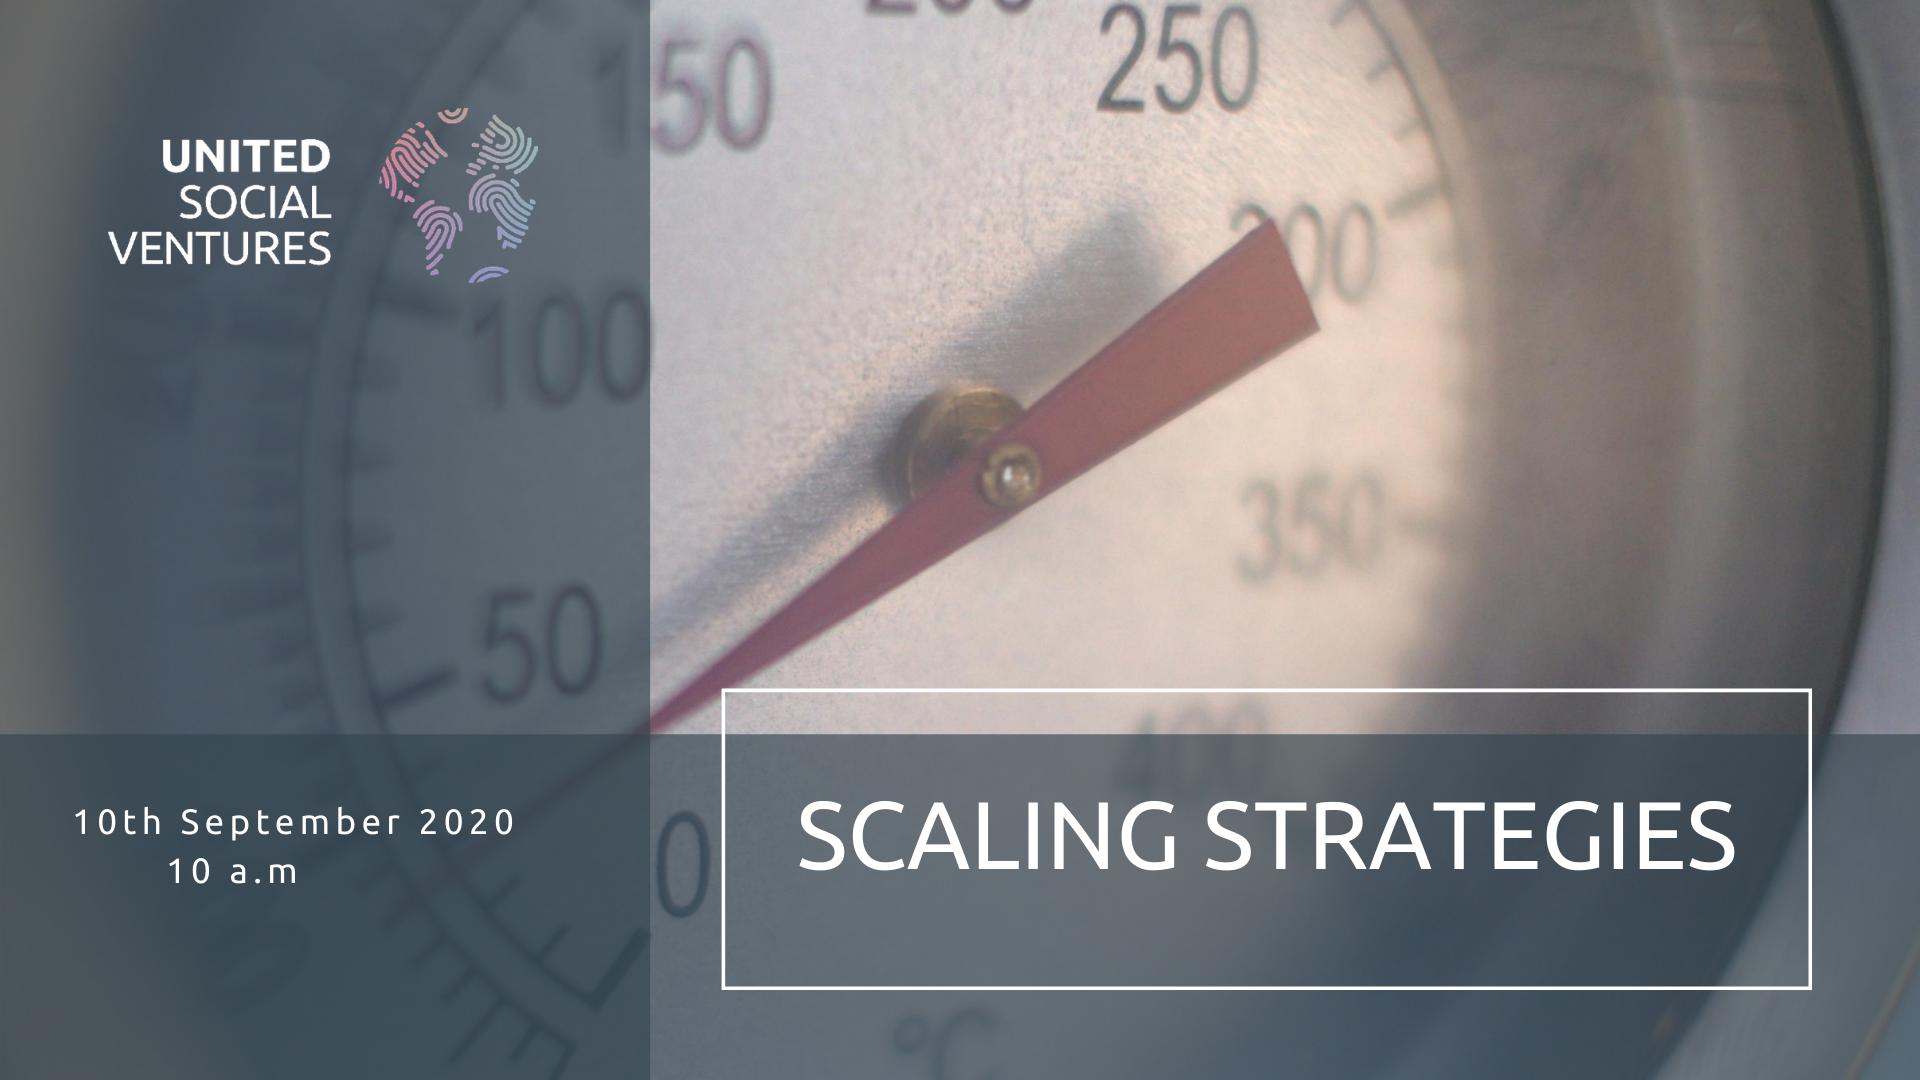 Scaling strategies